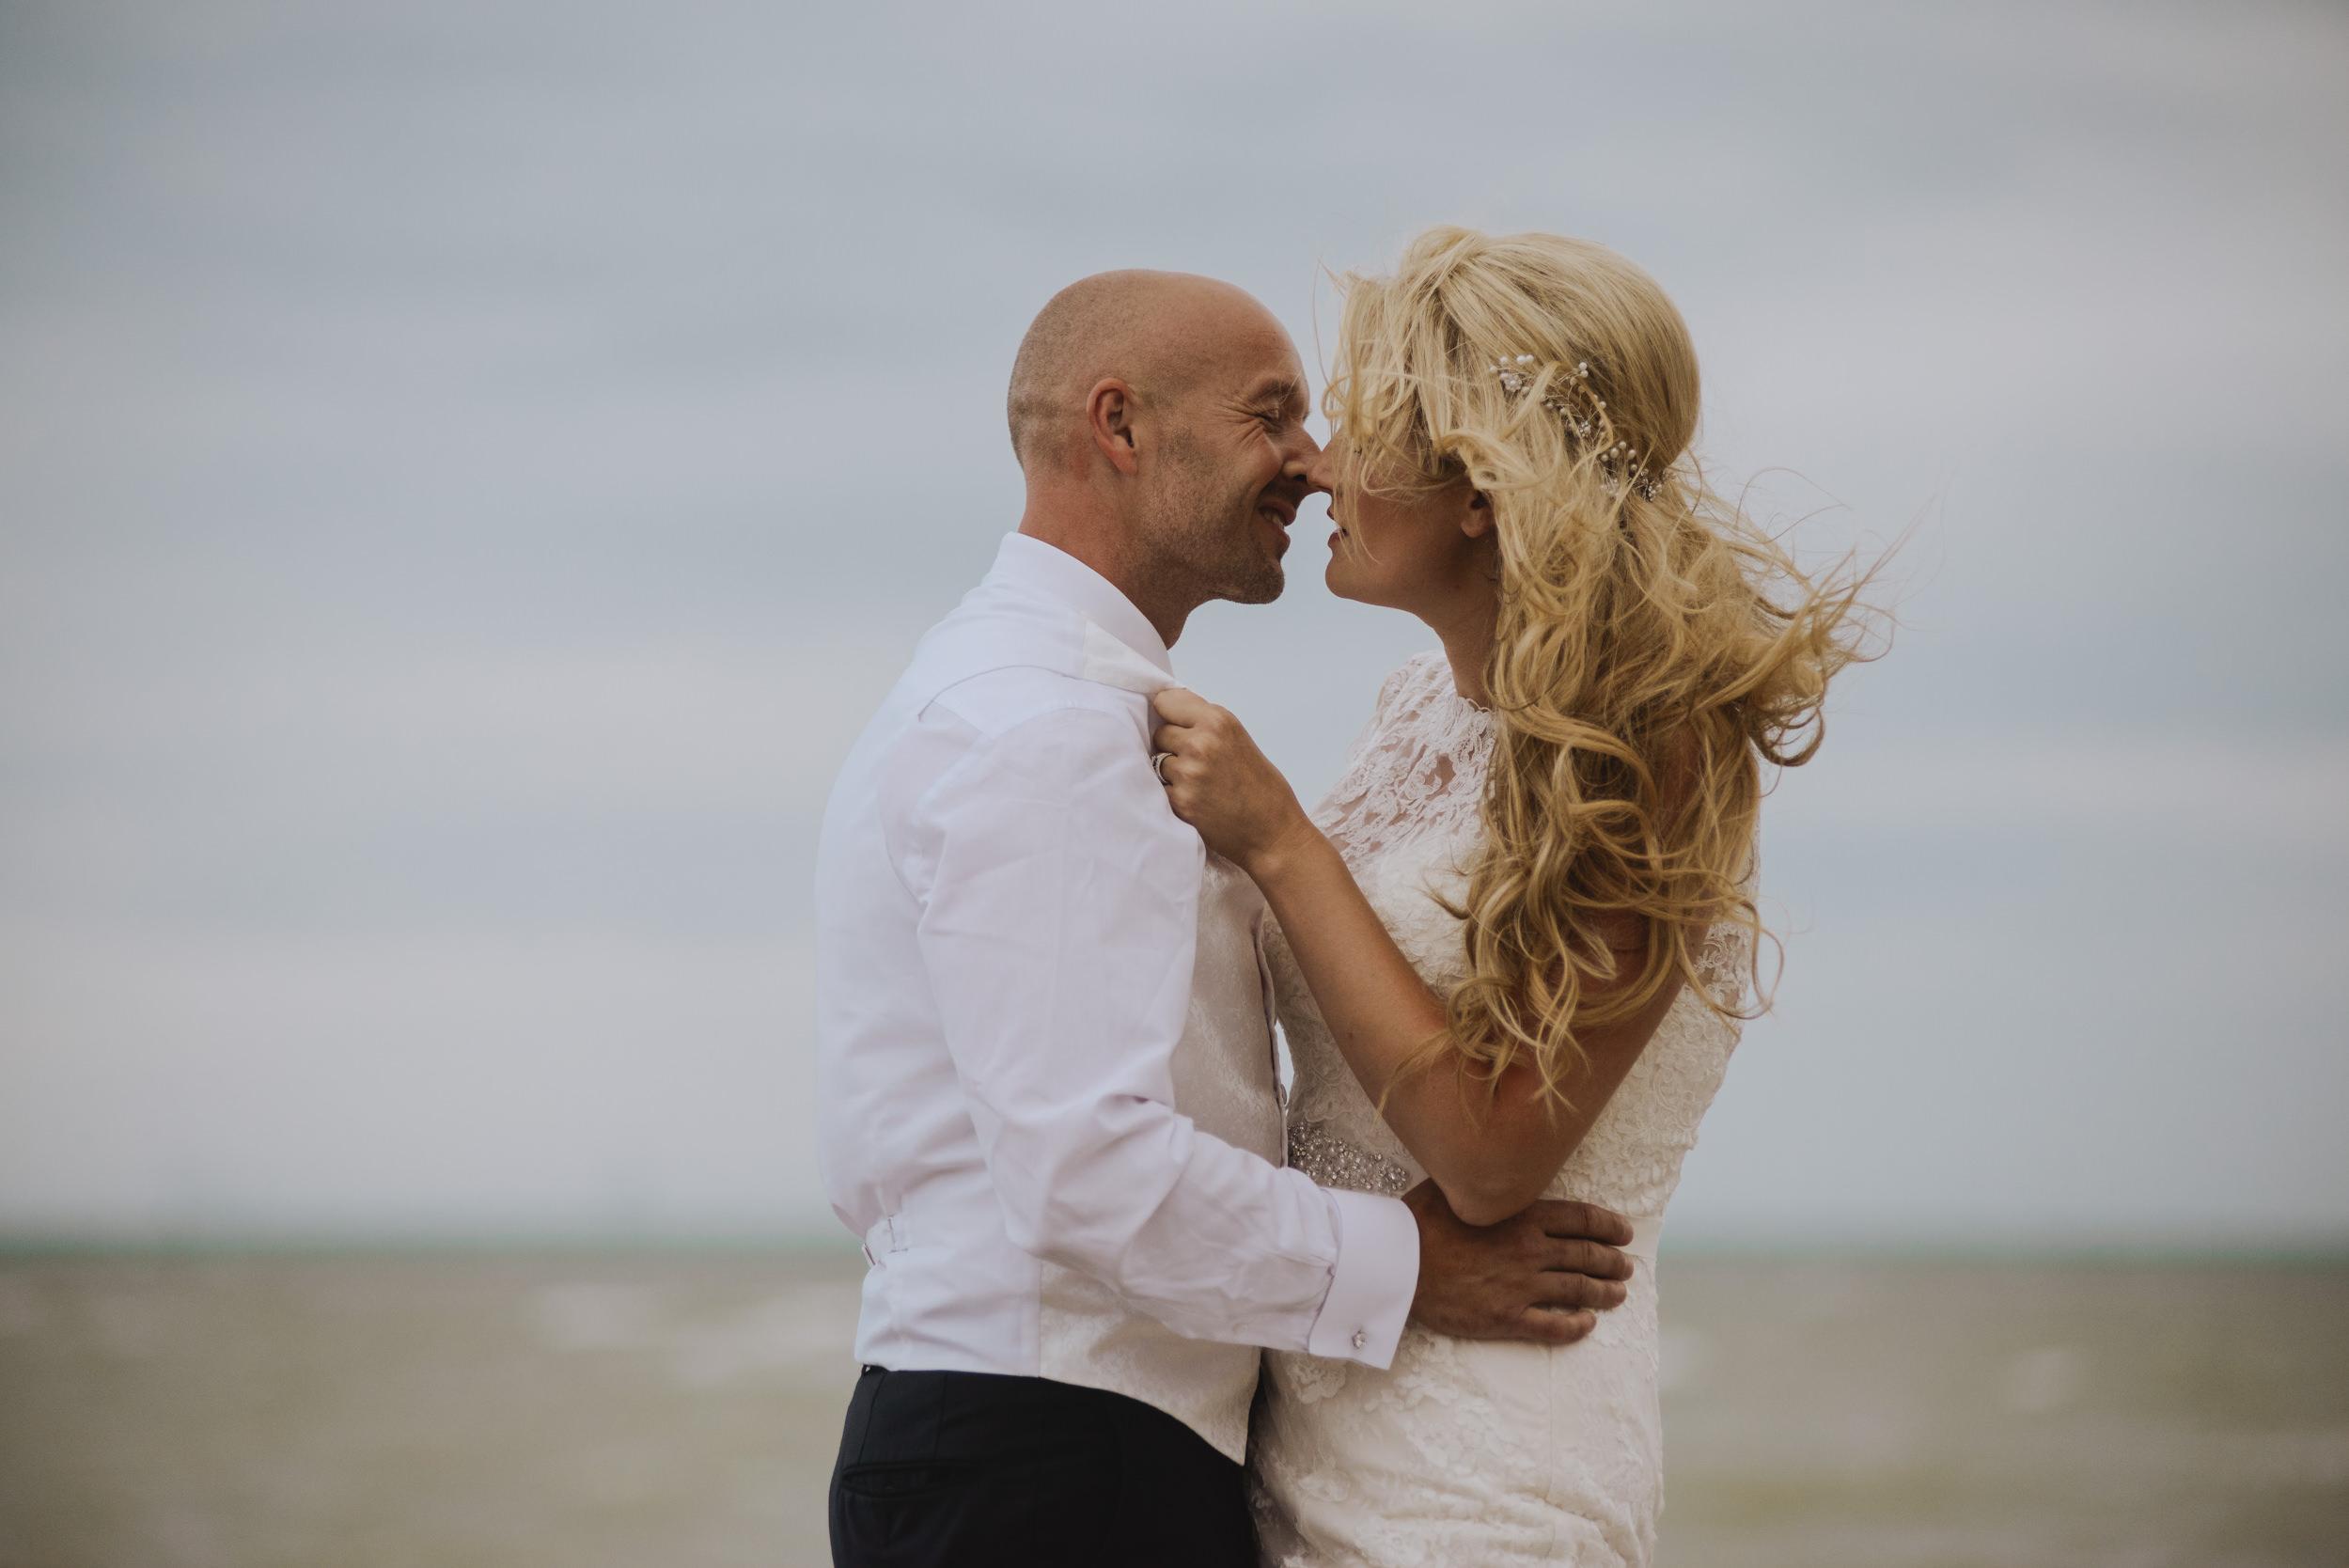 worthing-pier-wedding-020.JPG